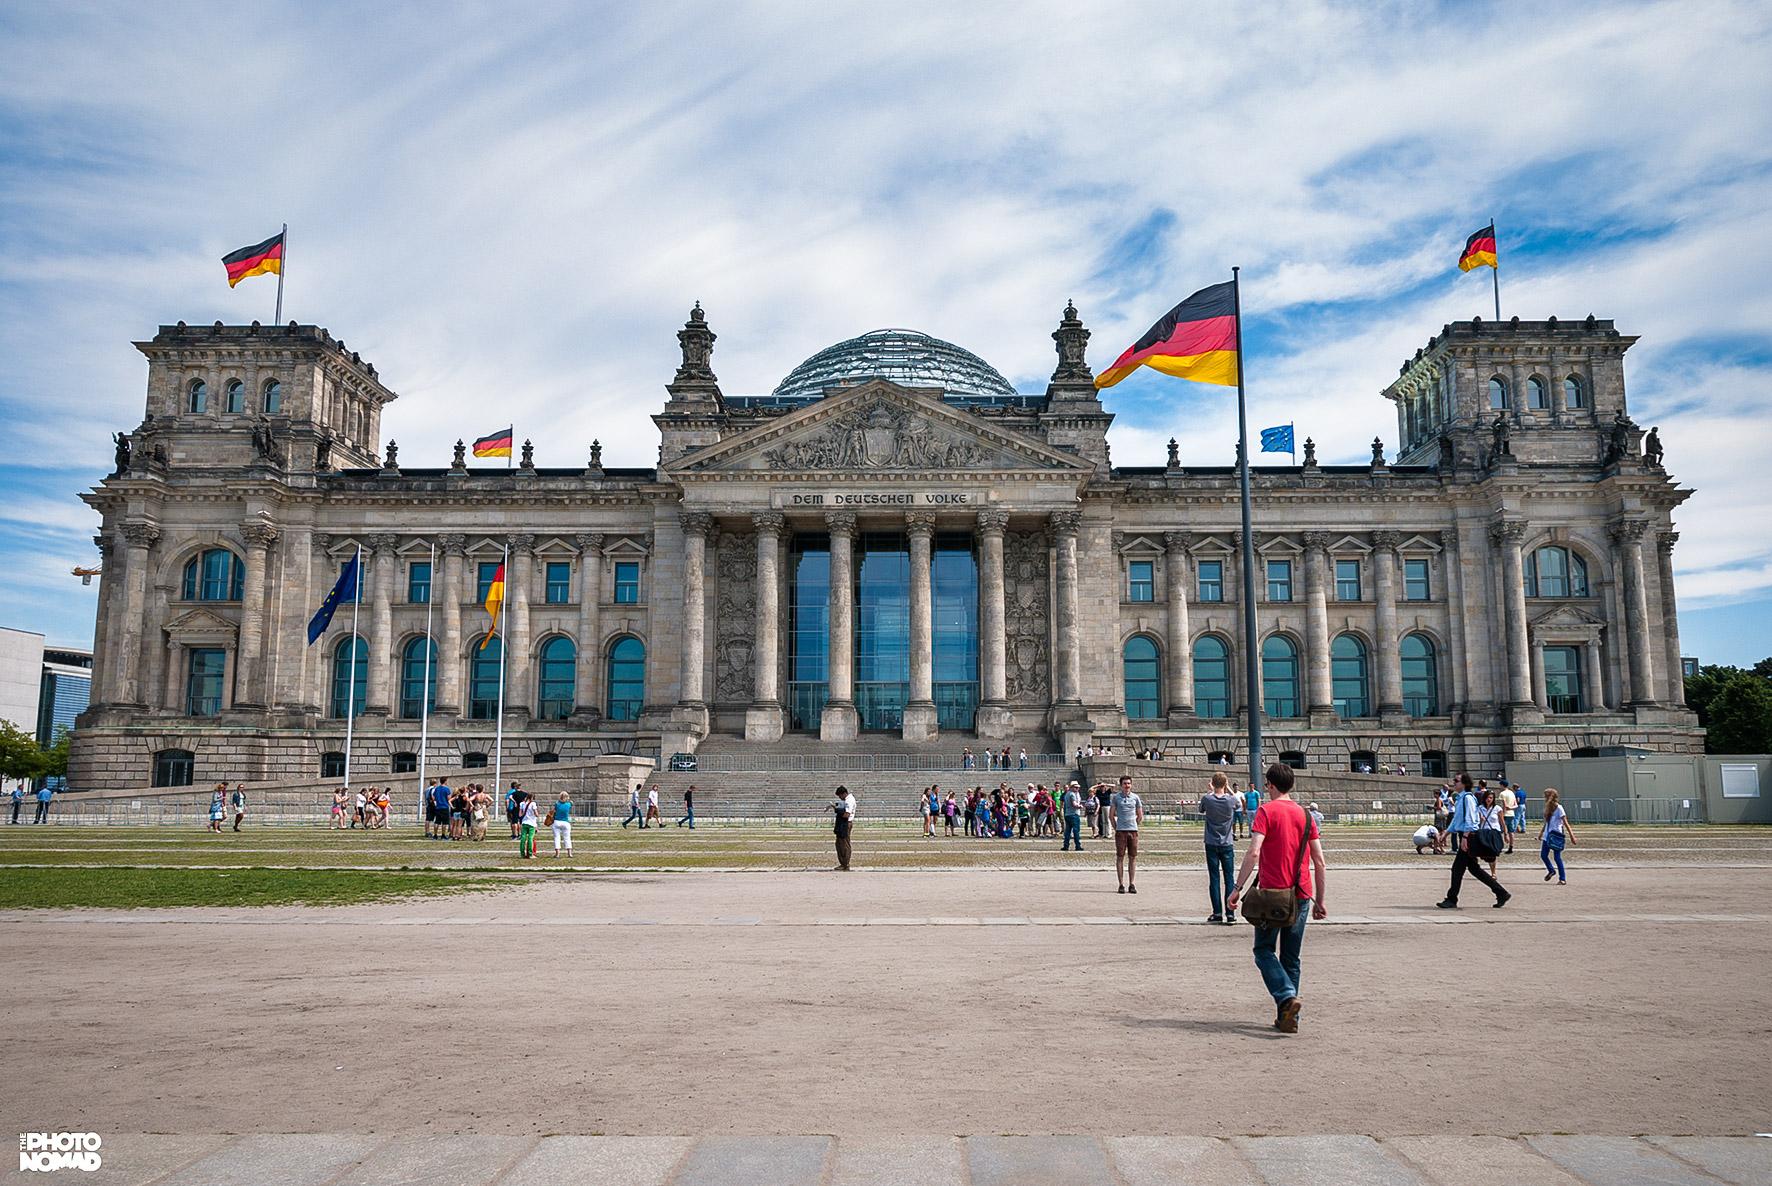 Reichstag Building, Berlin Germany